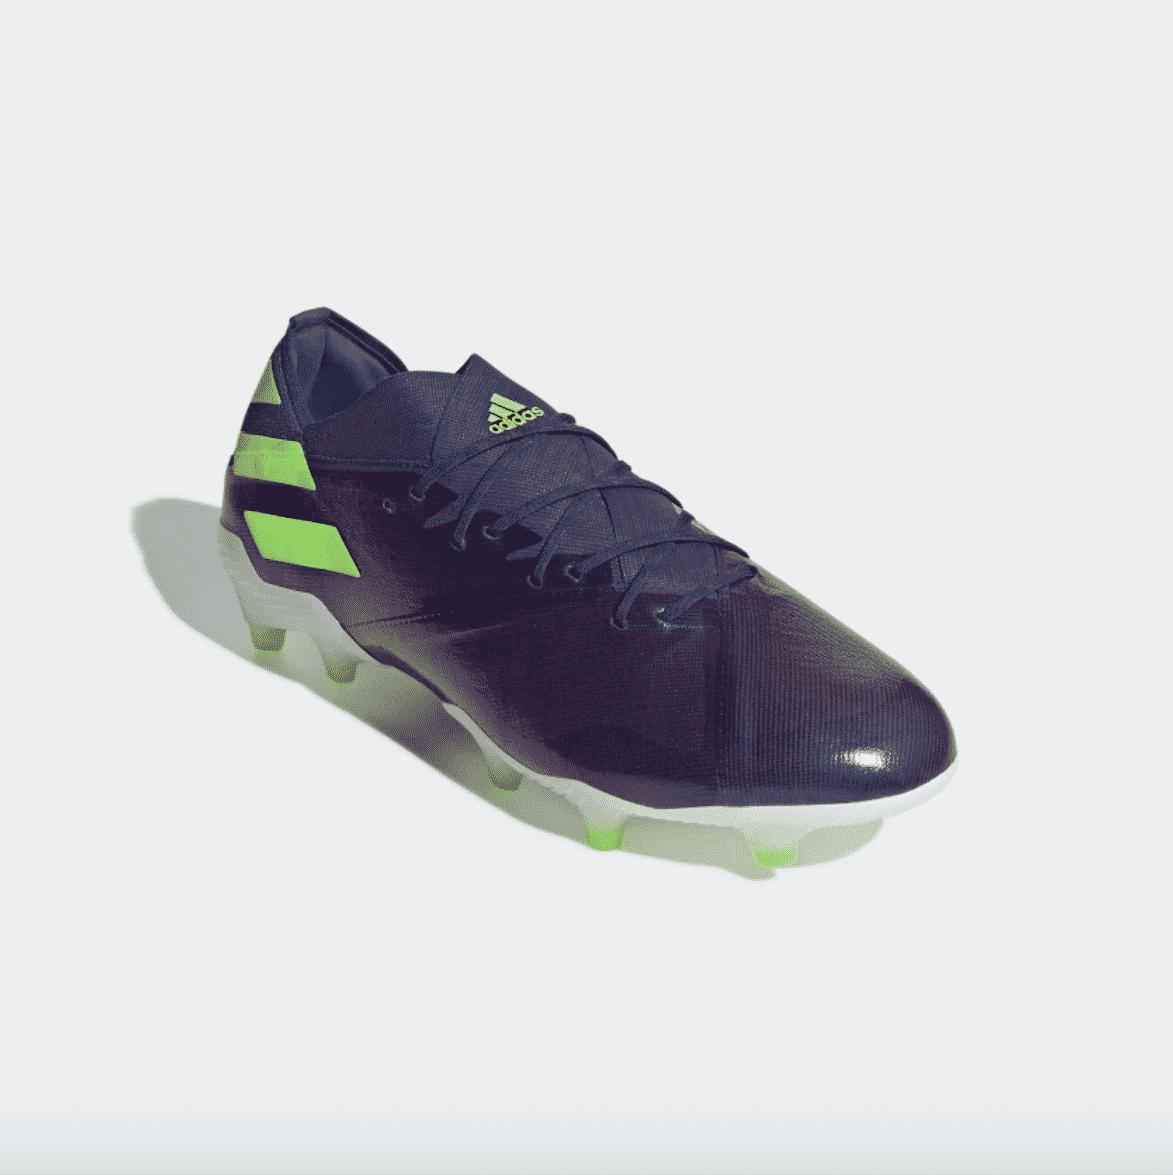 chaussures-adidas-nemeziz-19.1-lionel-messi-ballon-or-2019-5